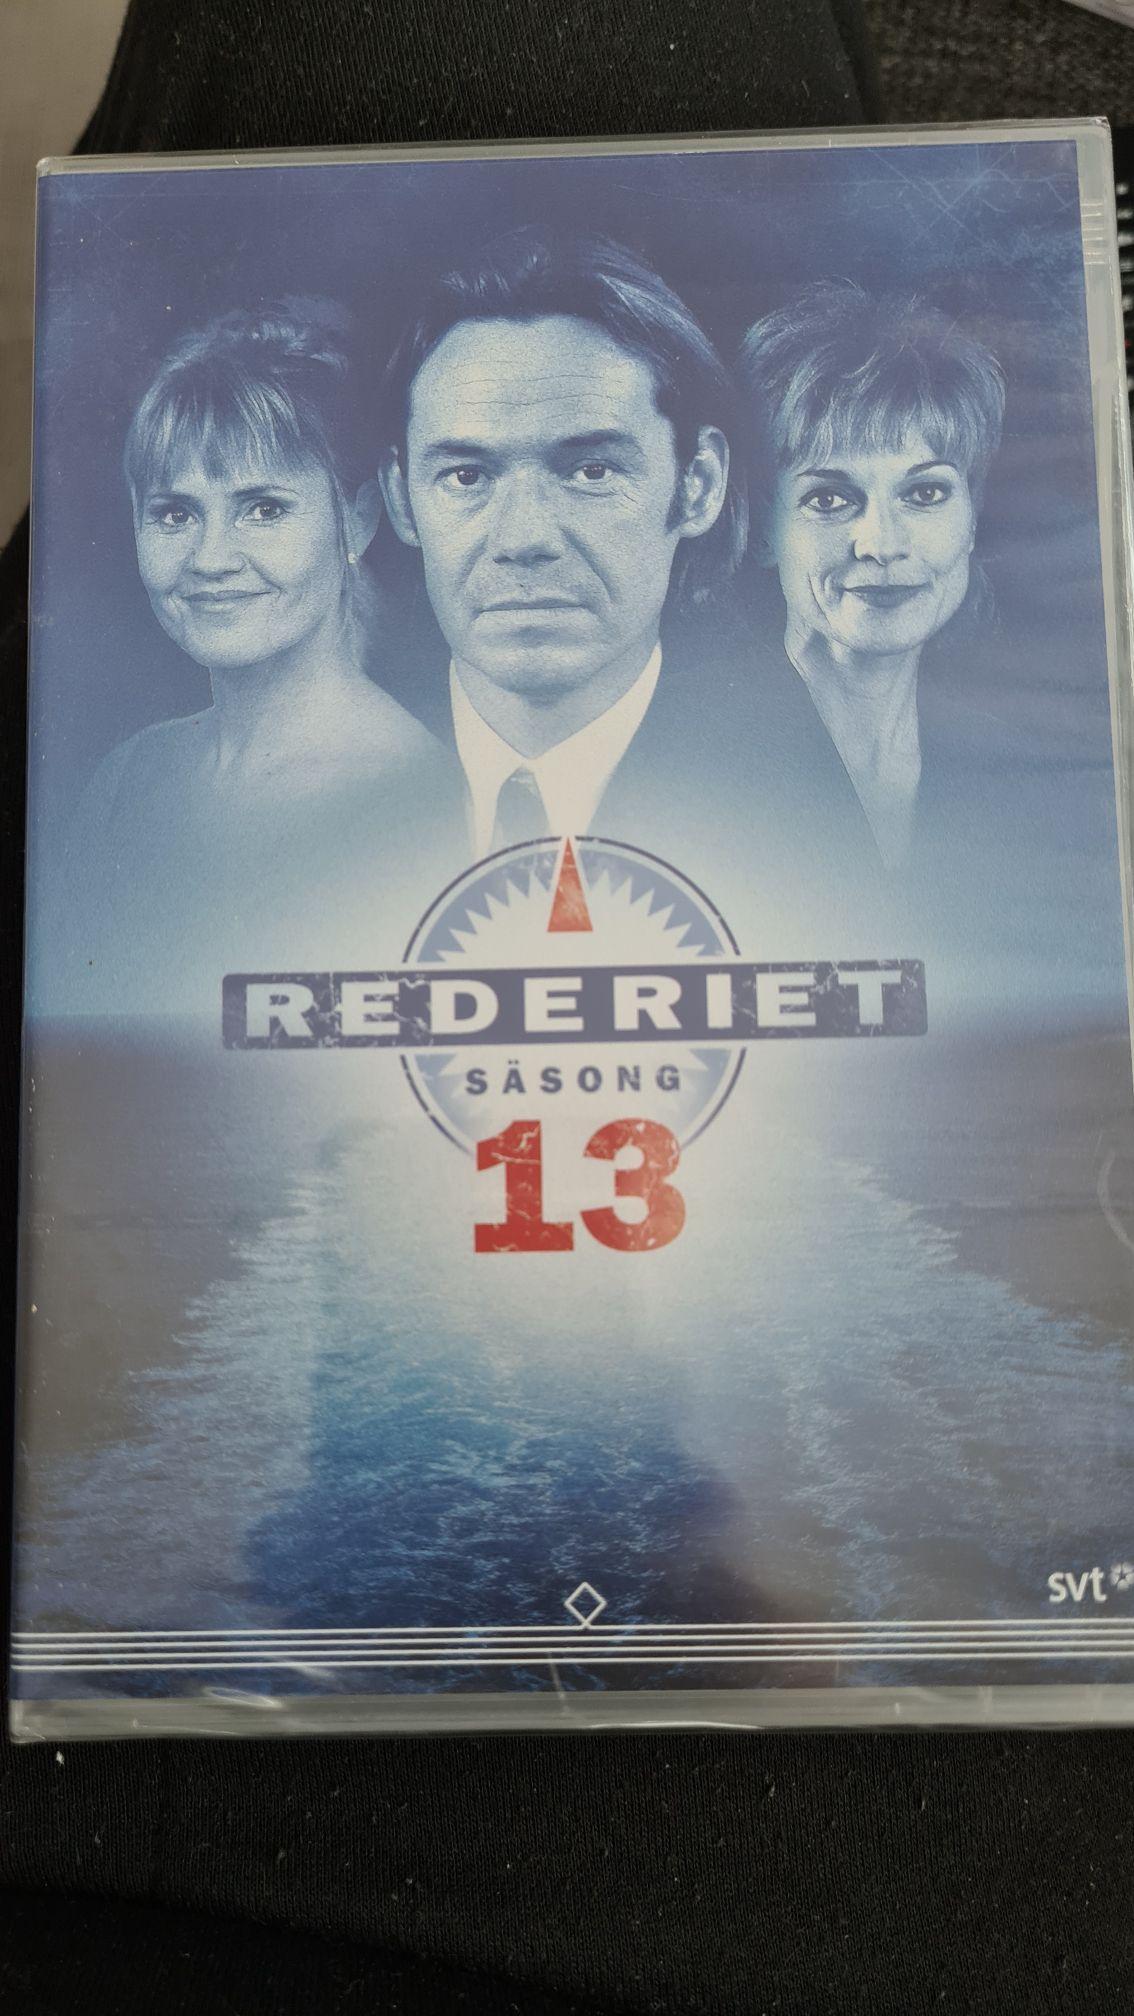 Rederiet. säsong 13 -  cover